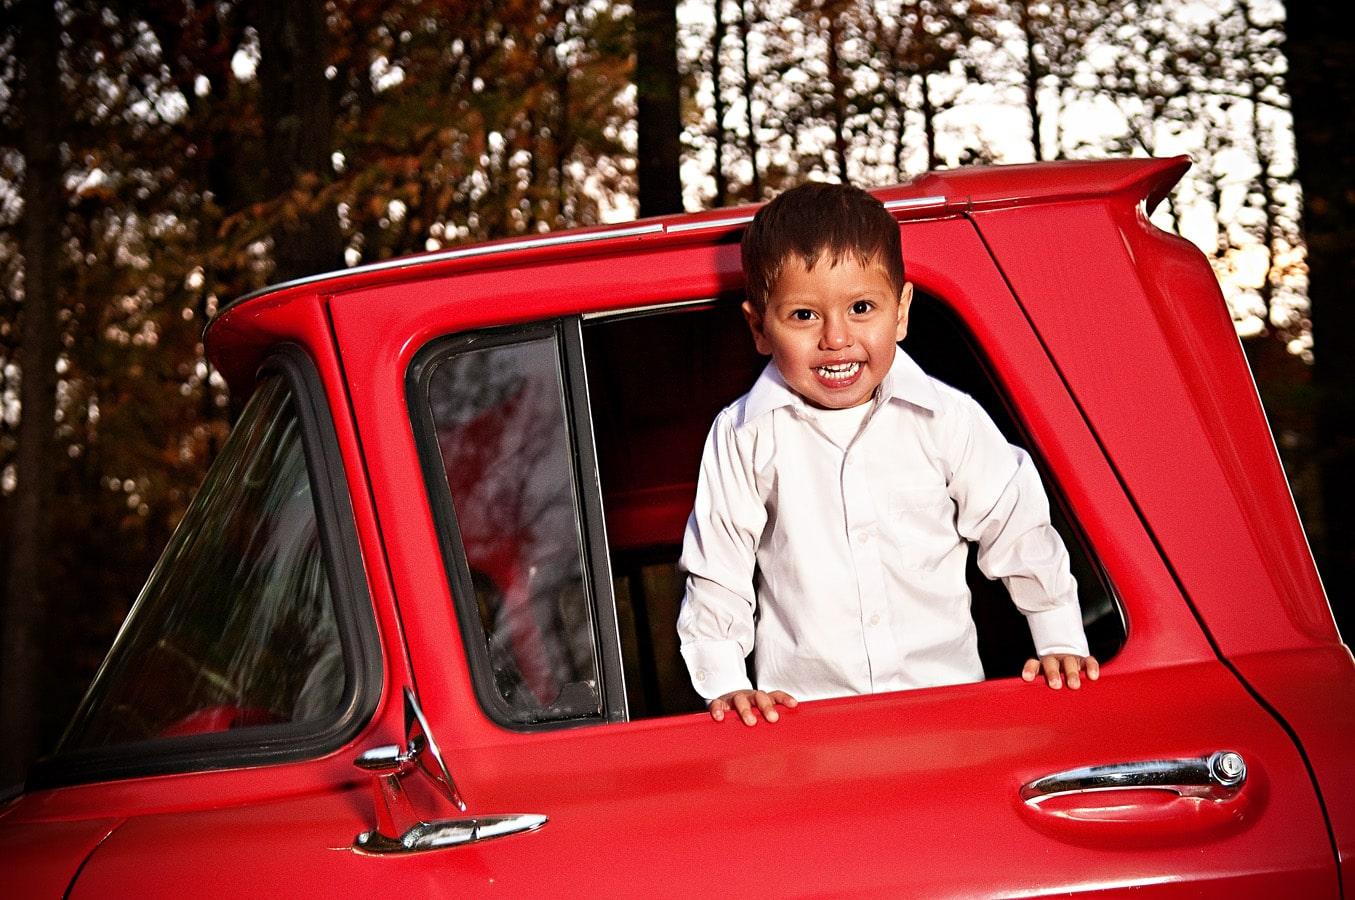 child, truck, outdoor, portrait, natural light, Northern VA